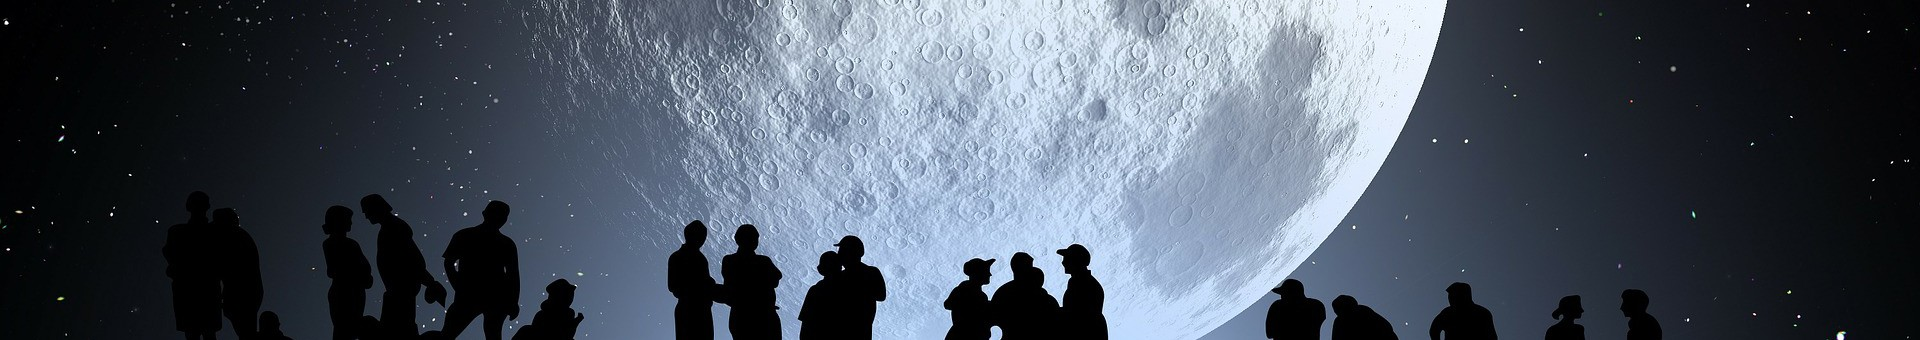 tetiaire-astro-2271